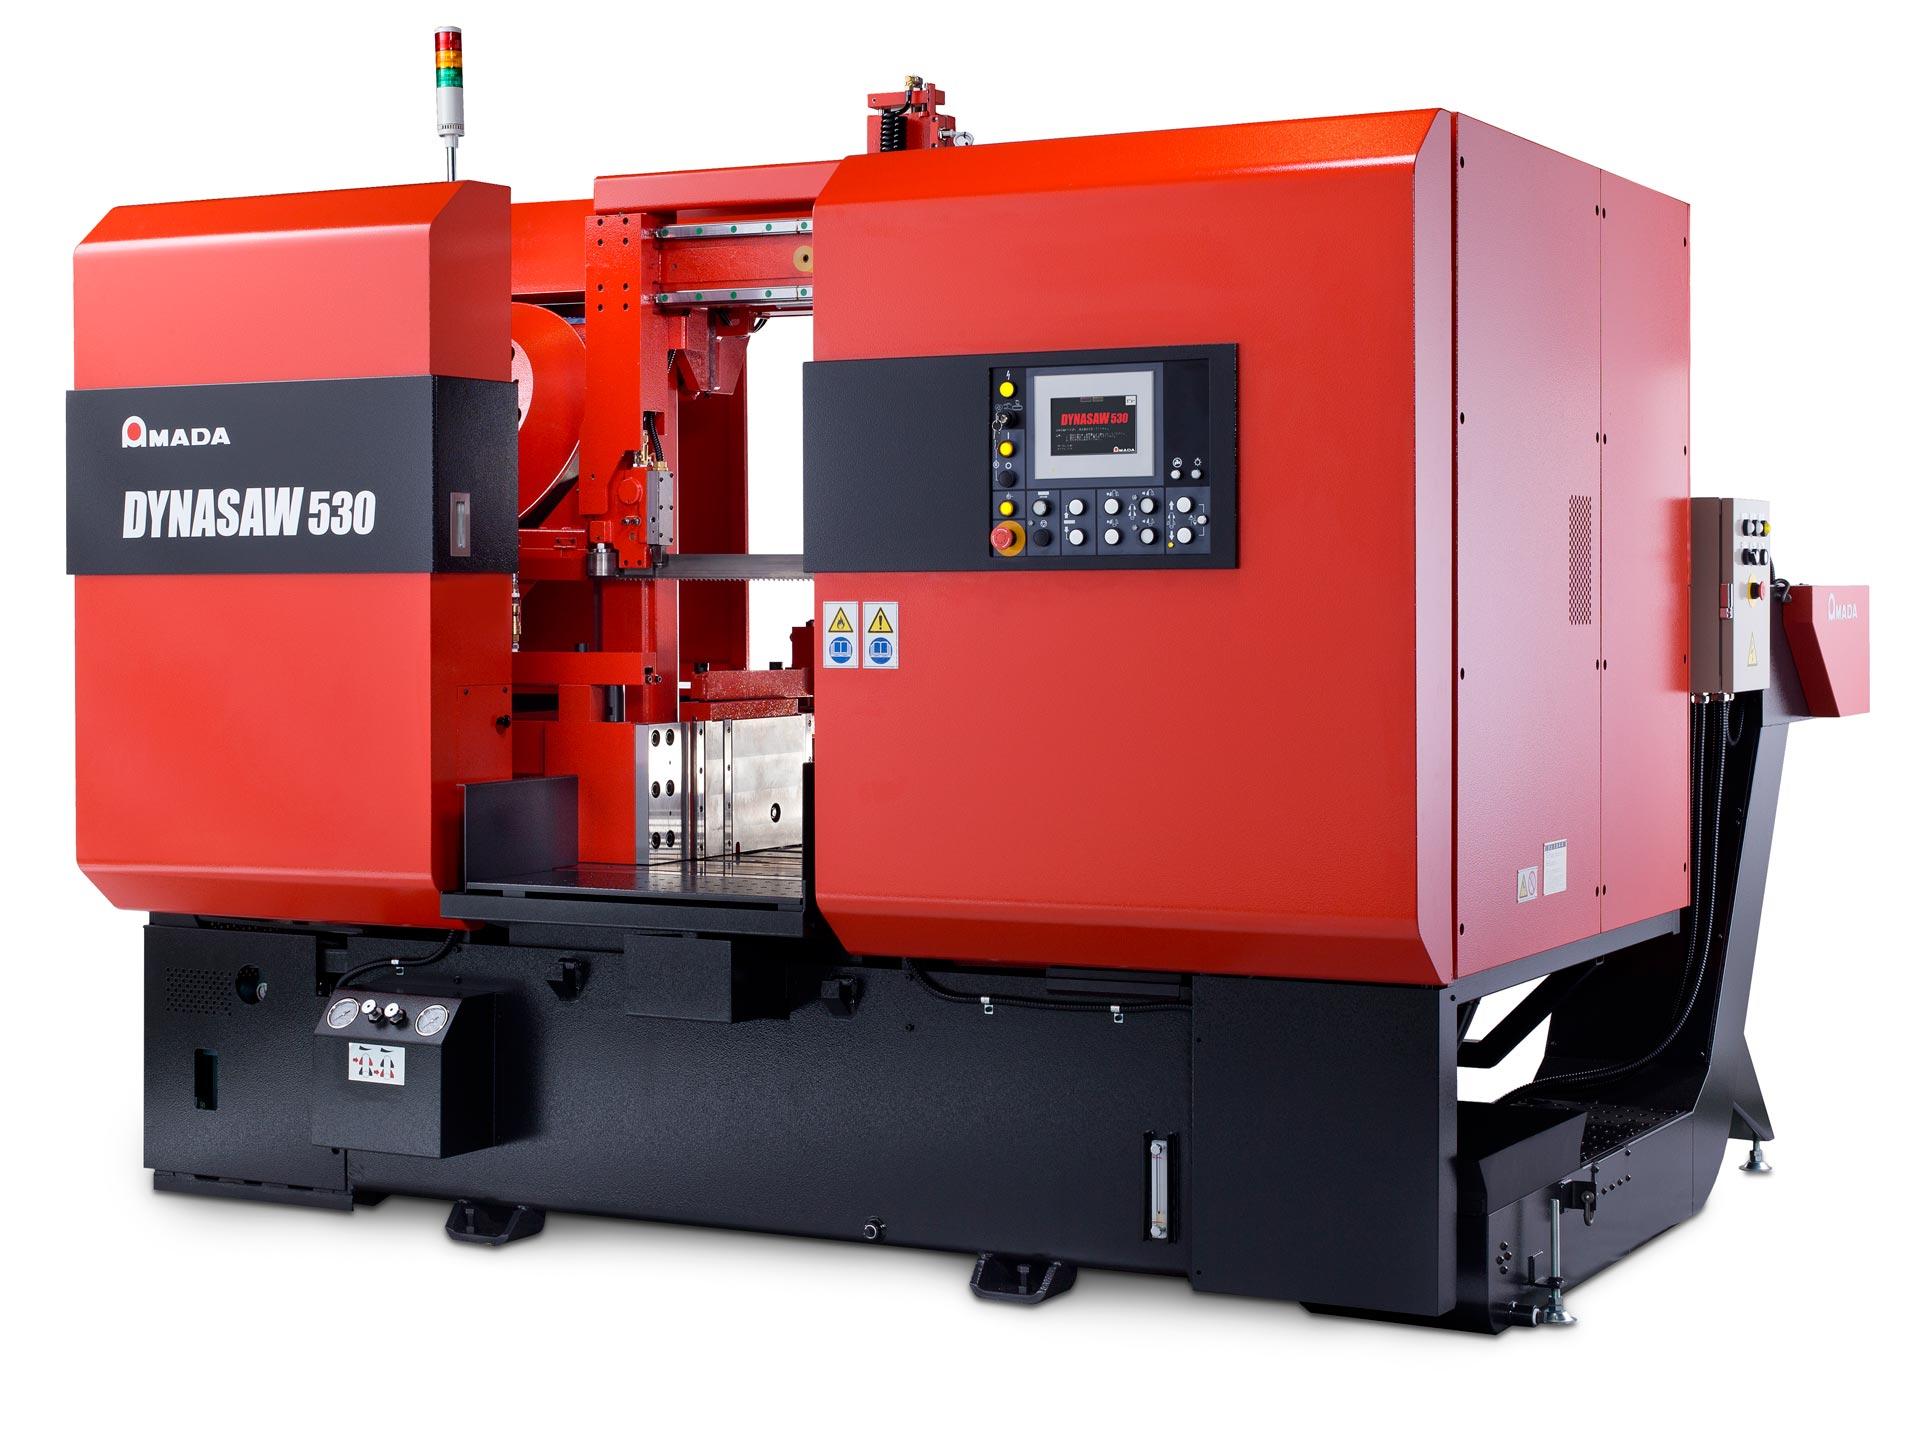 Spinner AG - Amada Dynasaw 530